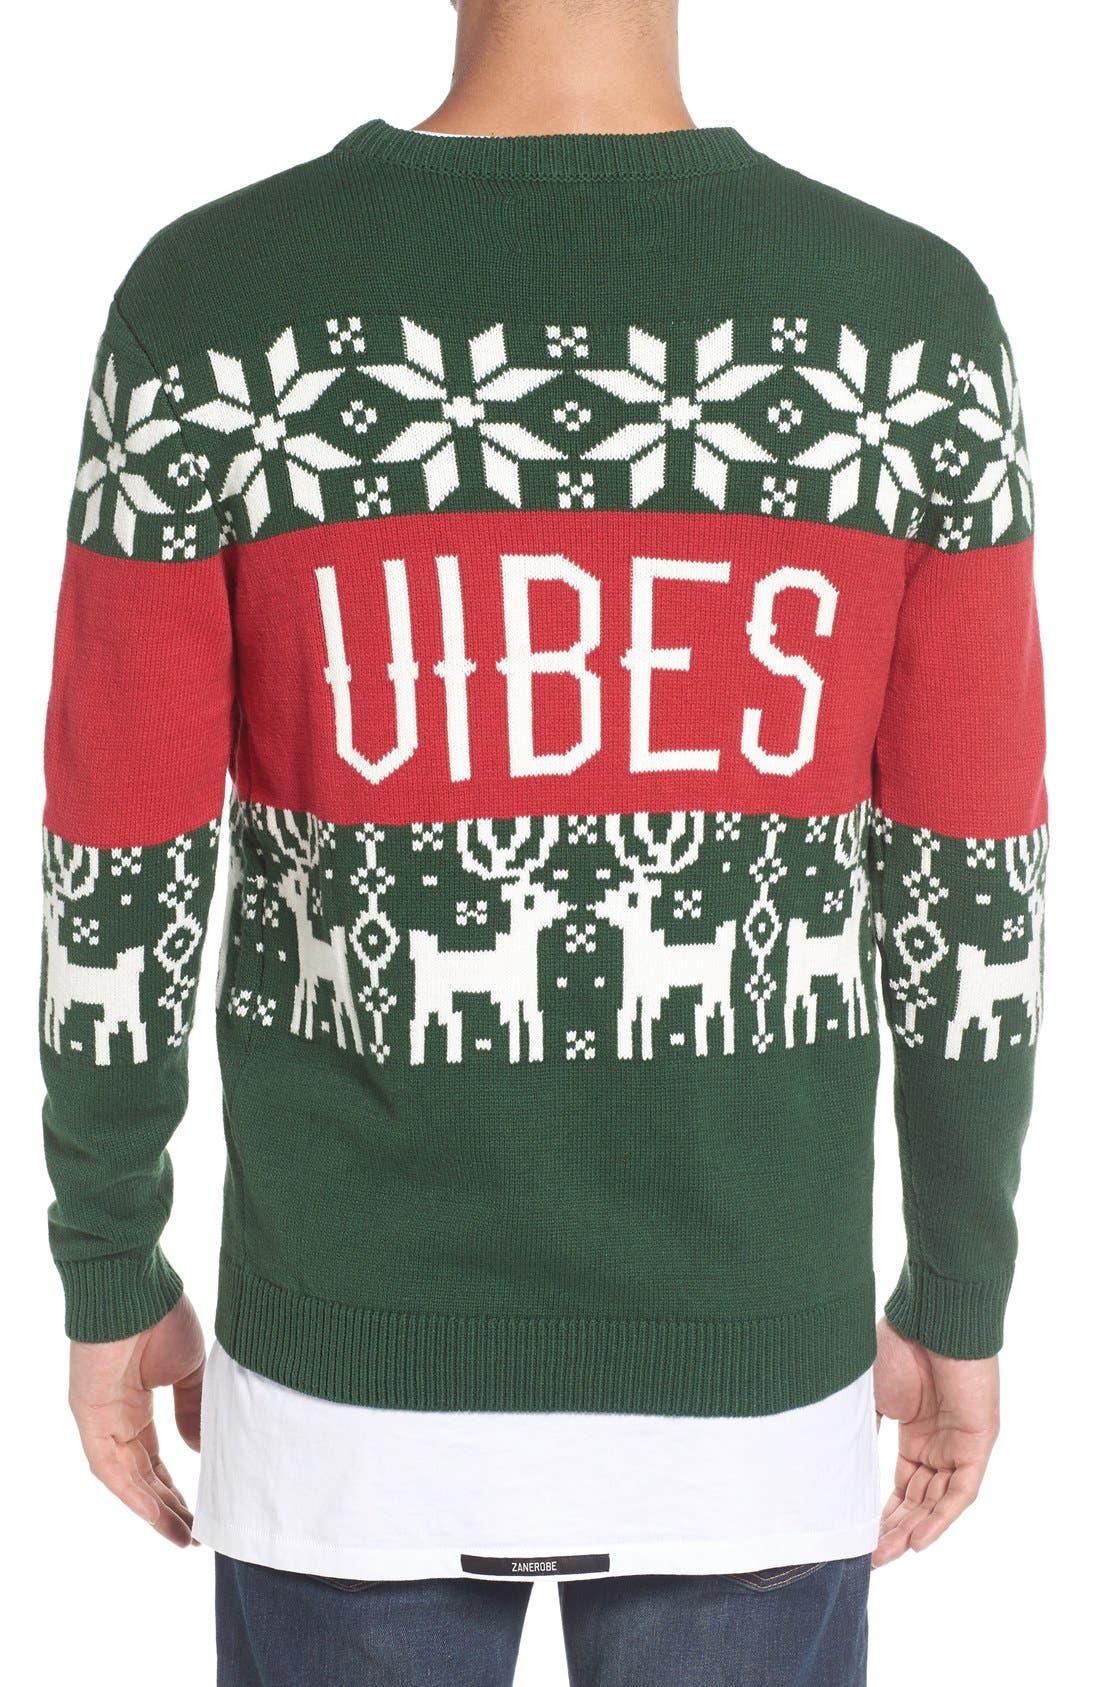 'Chill Vibes' Intarsia Crewneck Sweater,                             Alternate thumbnail 2, color,                             641